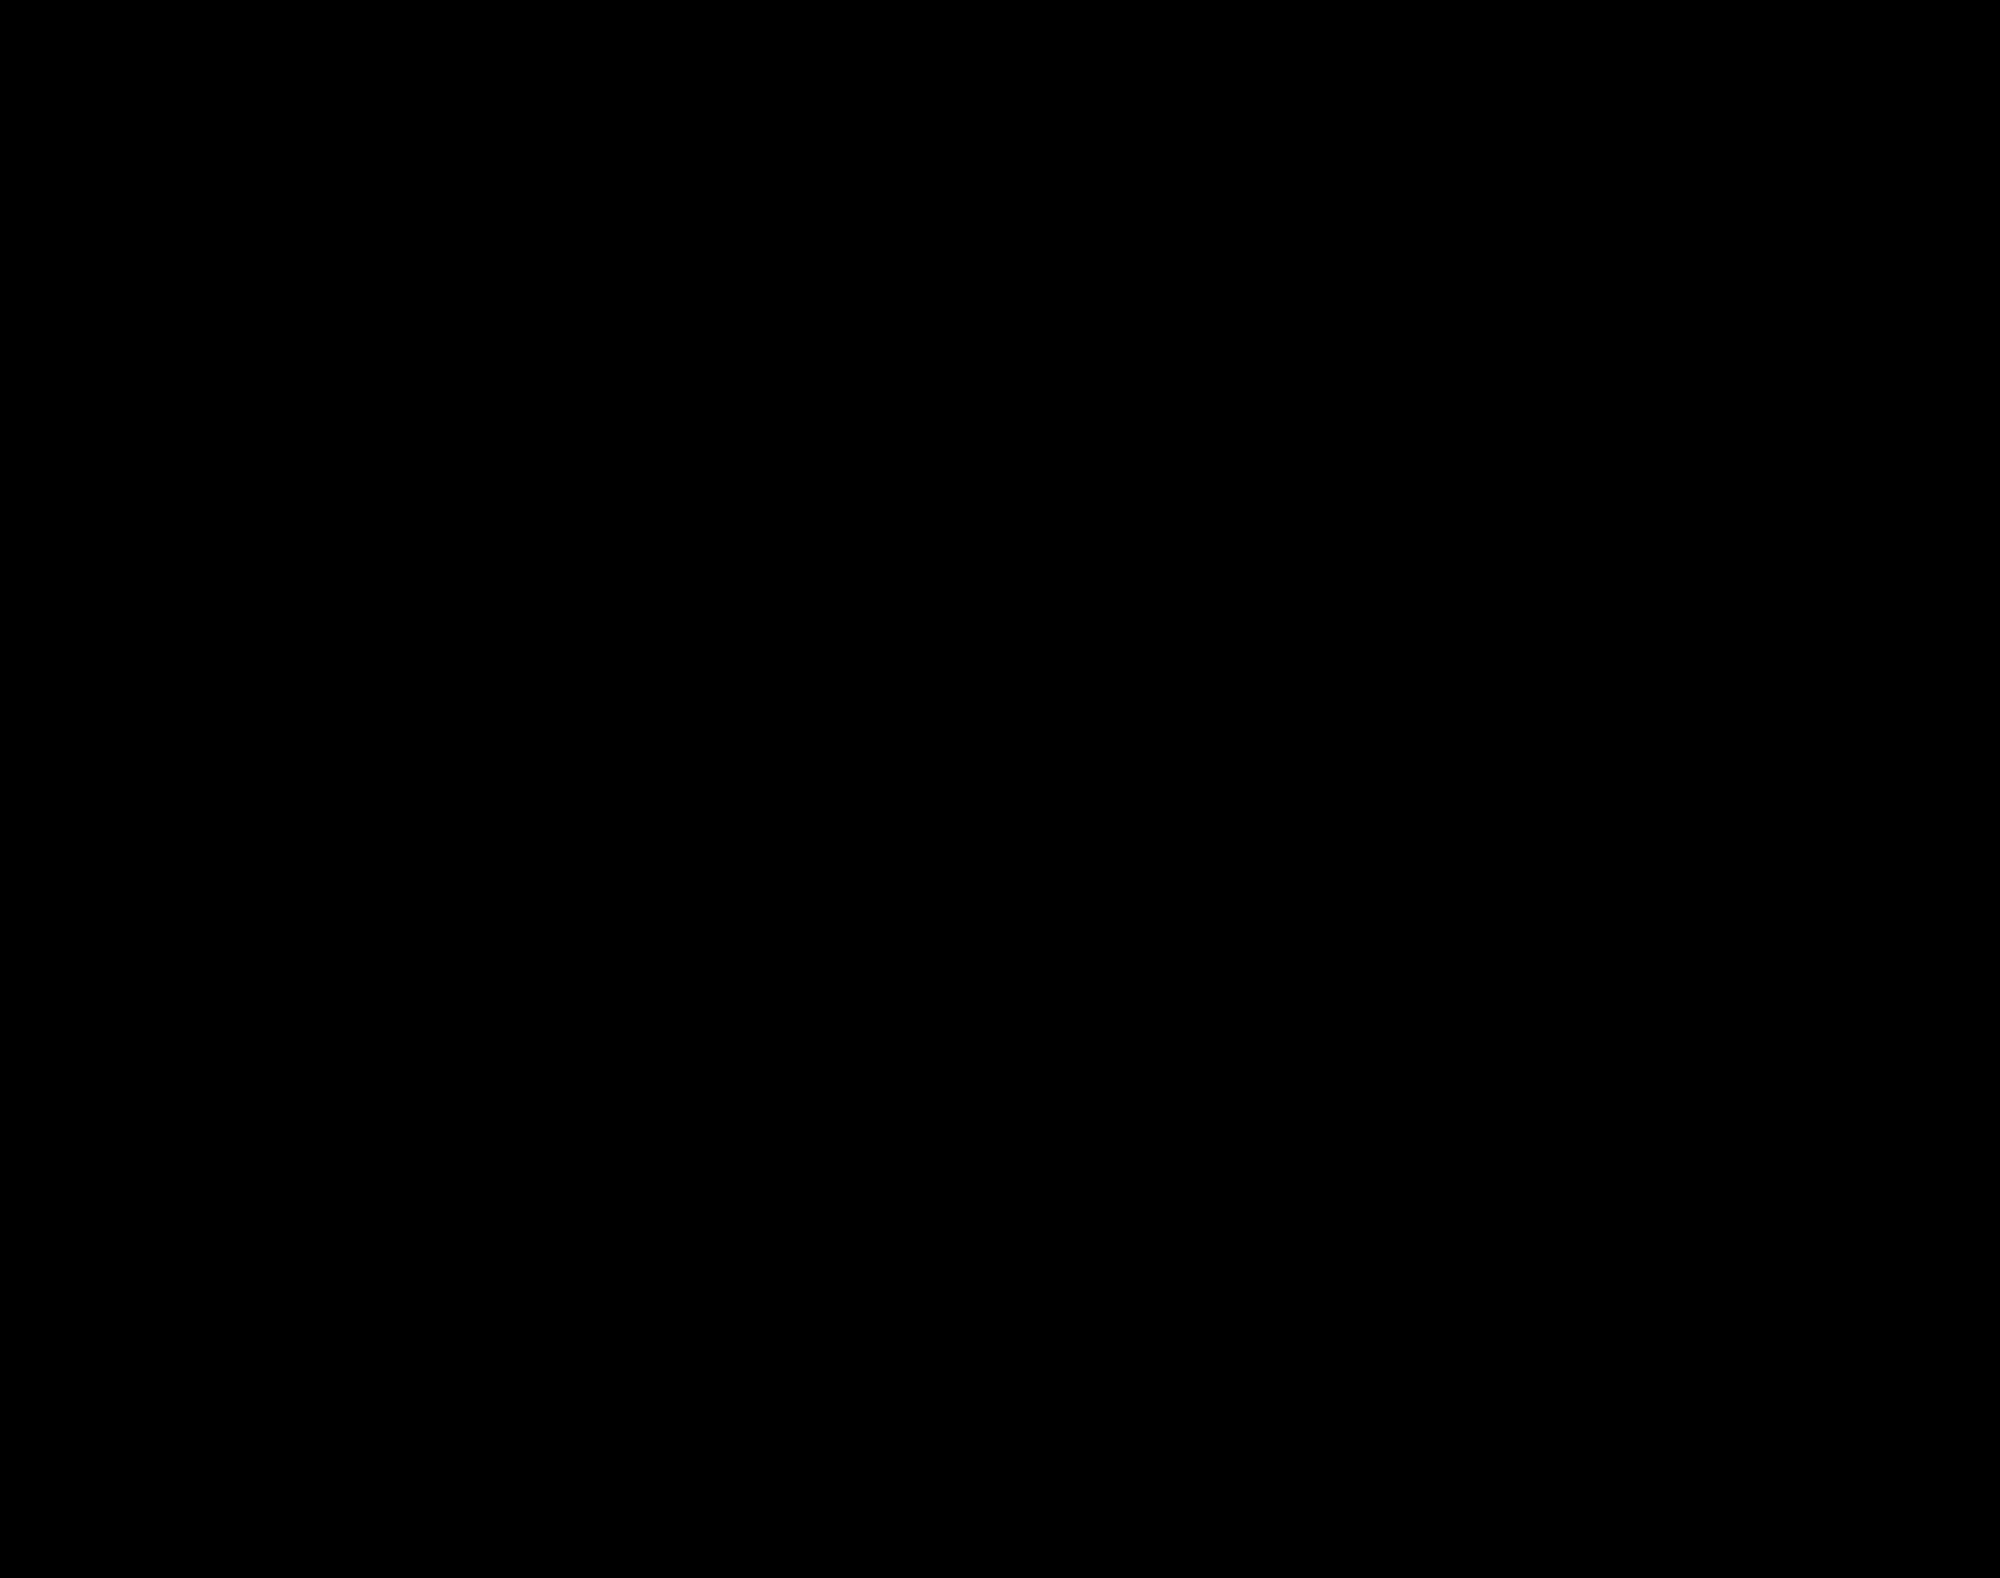 2000x1578 Filesilhouette 1 (Mouton).svg